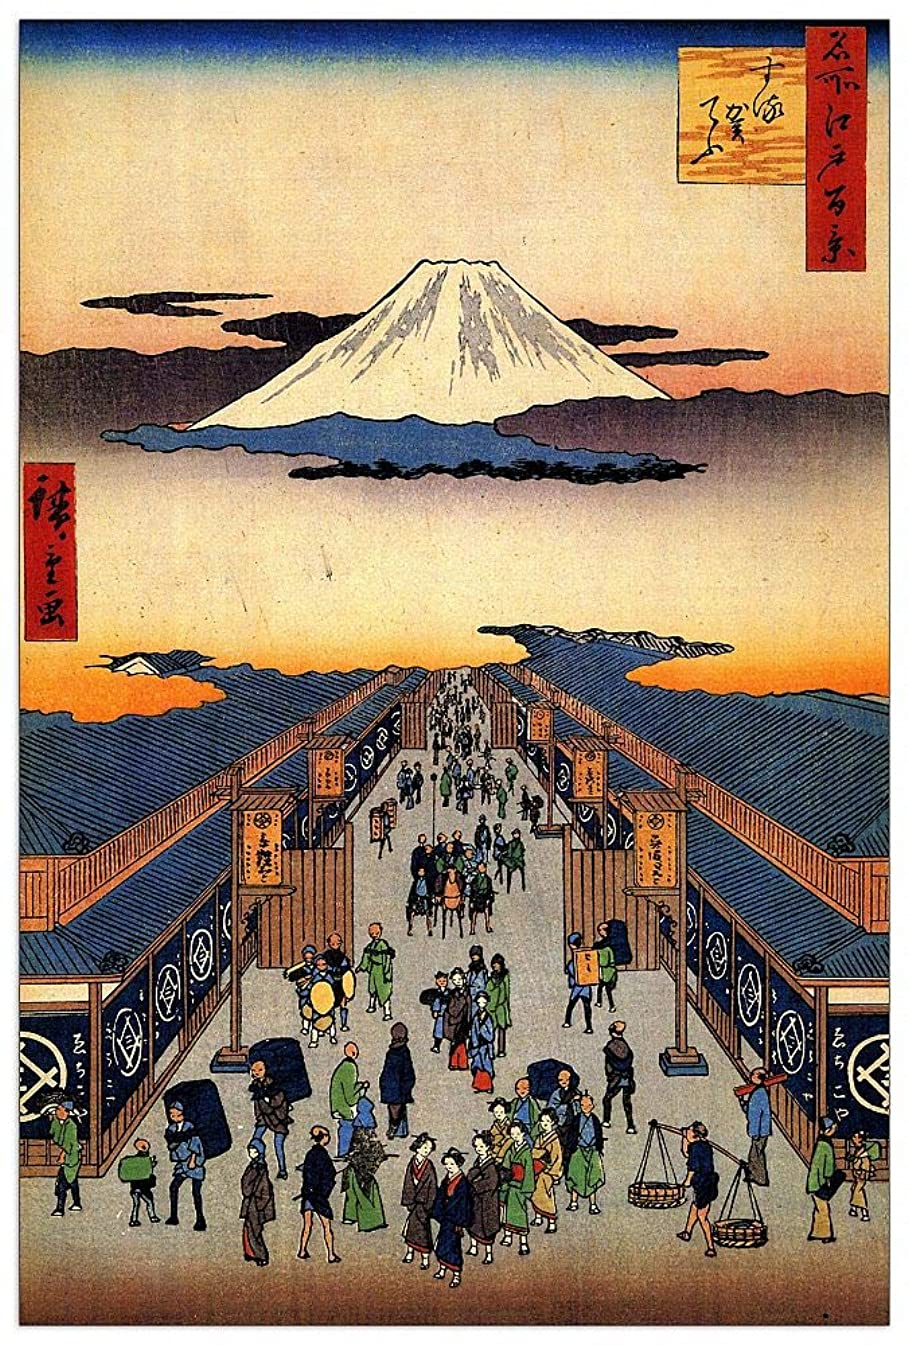 ArtPlaza TW92964 Hiroshige Utagawa - Suruga-cho Decorative Panel, 27.5x39.5 Inch, Multicolored